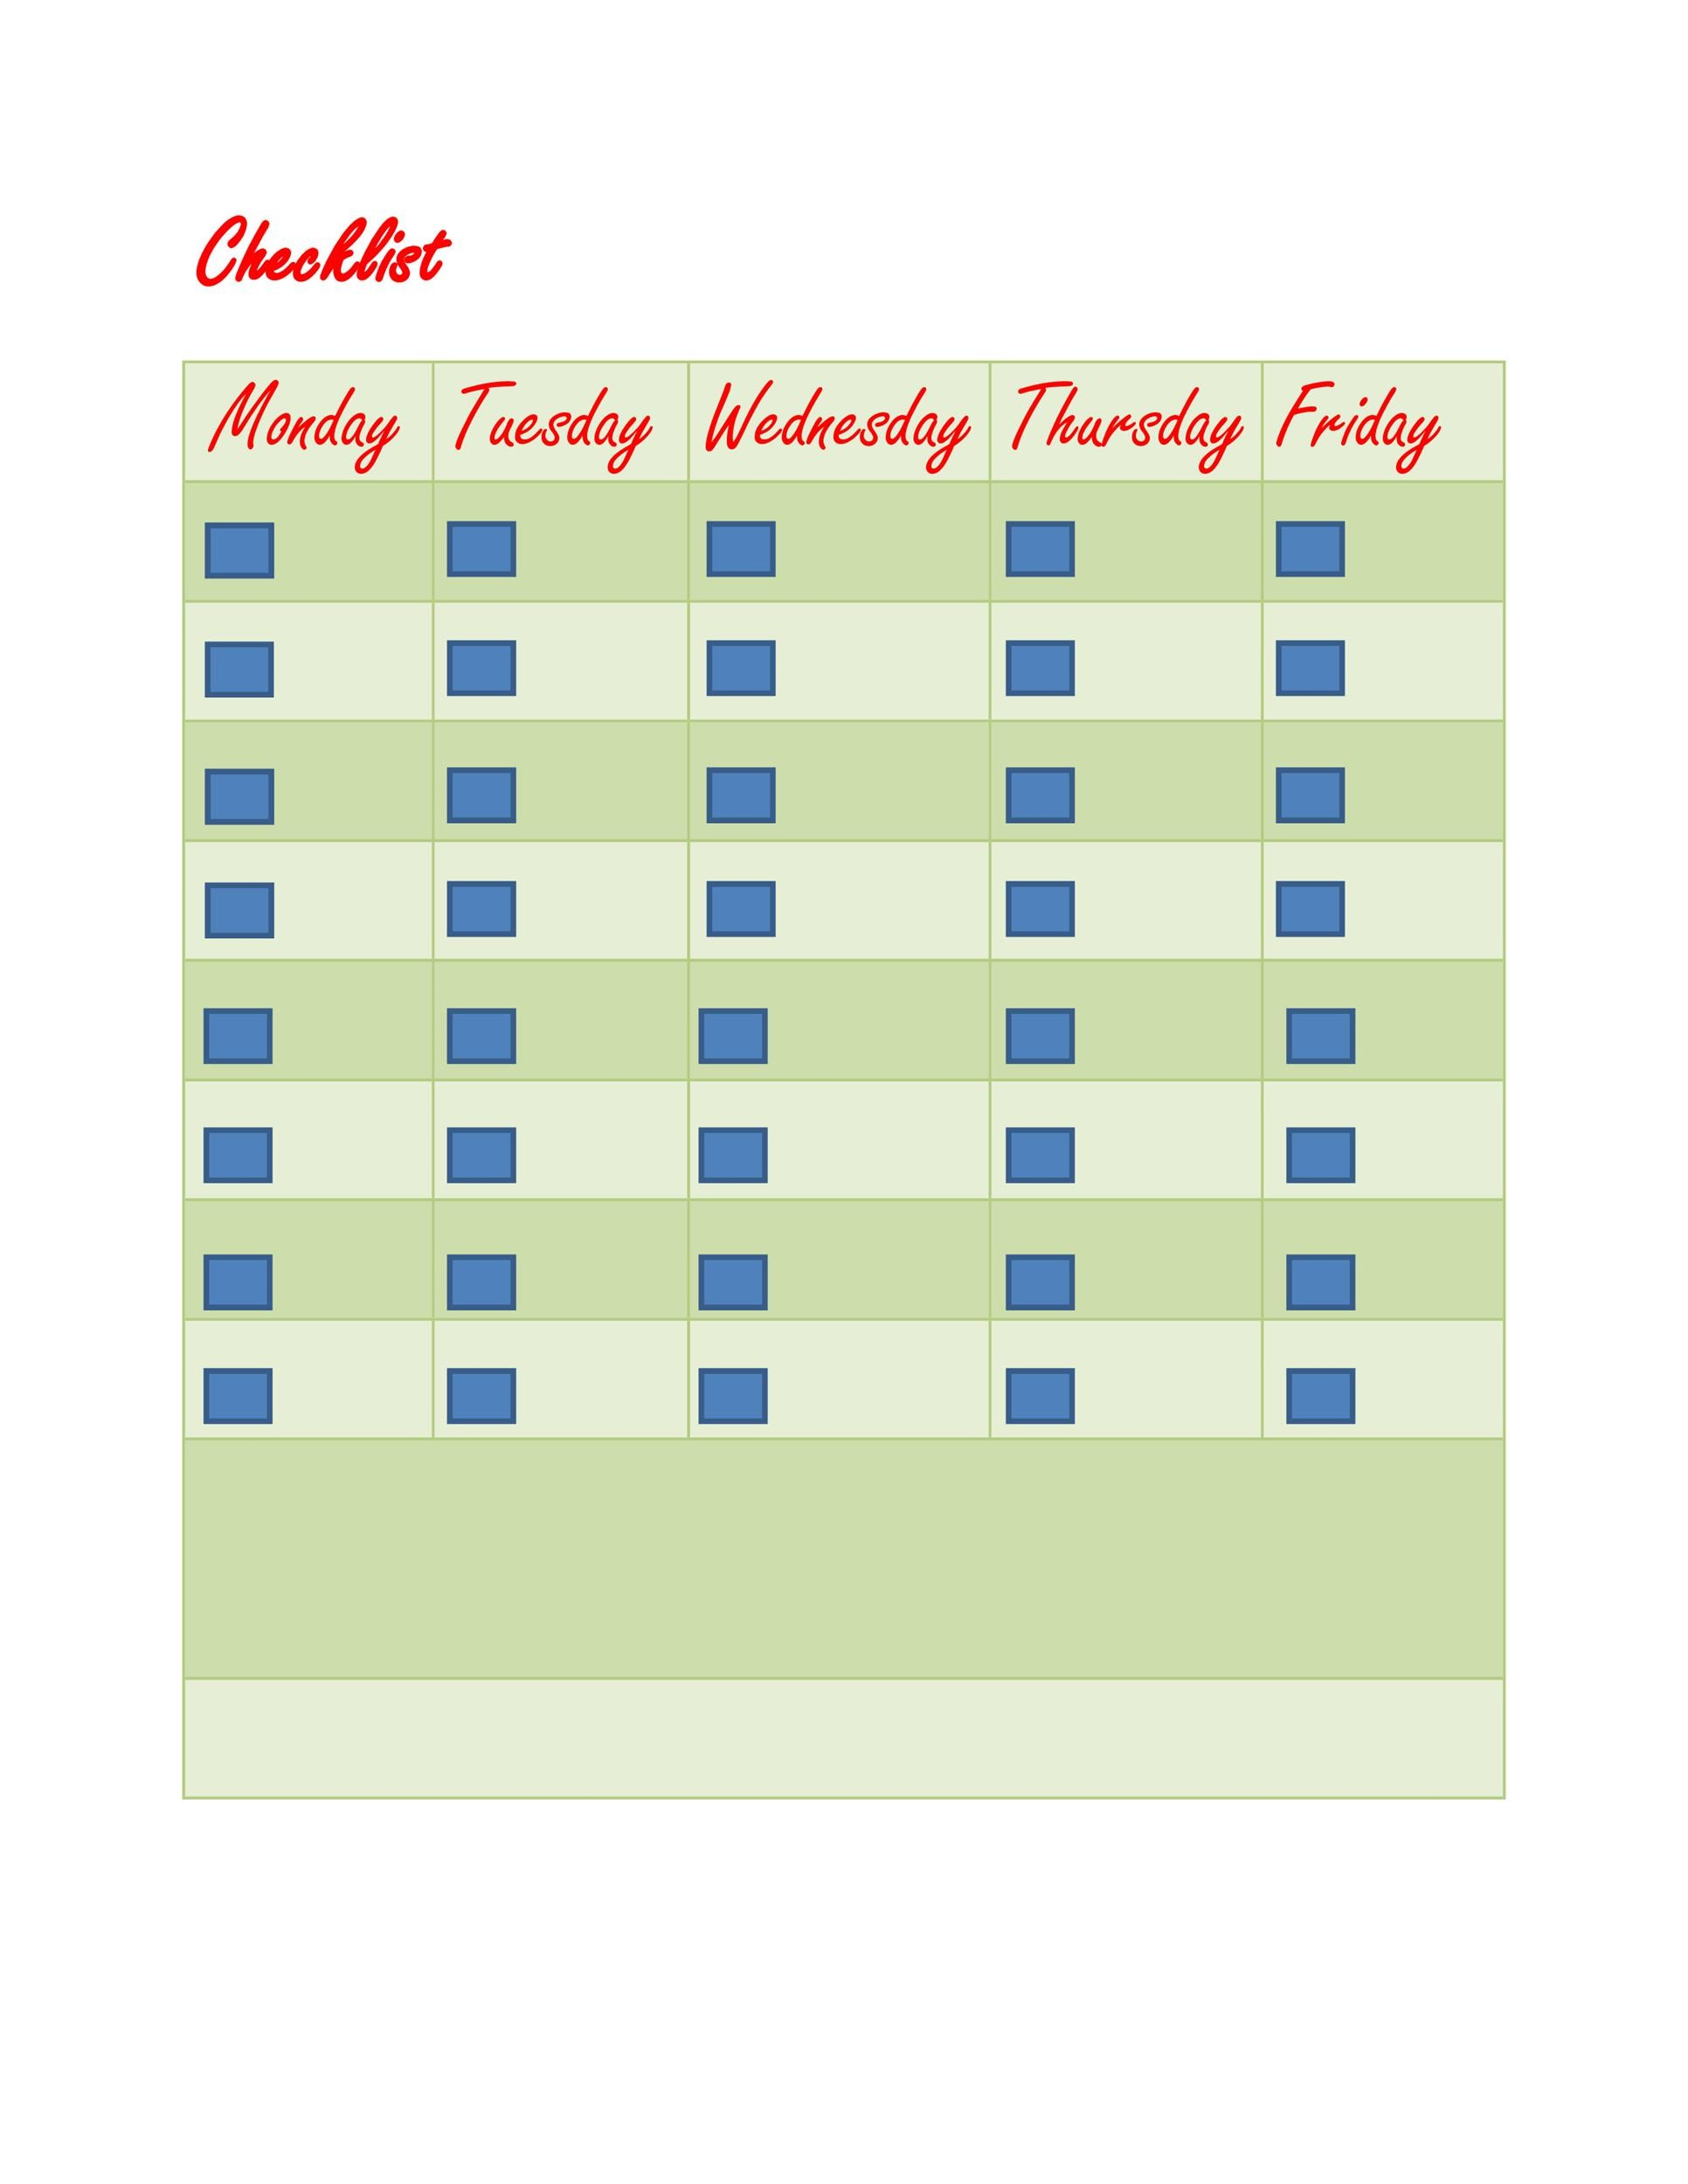 Free Checklist Template 08